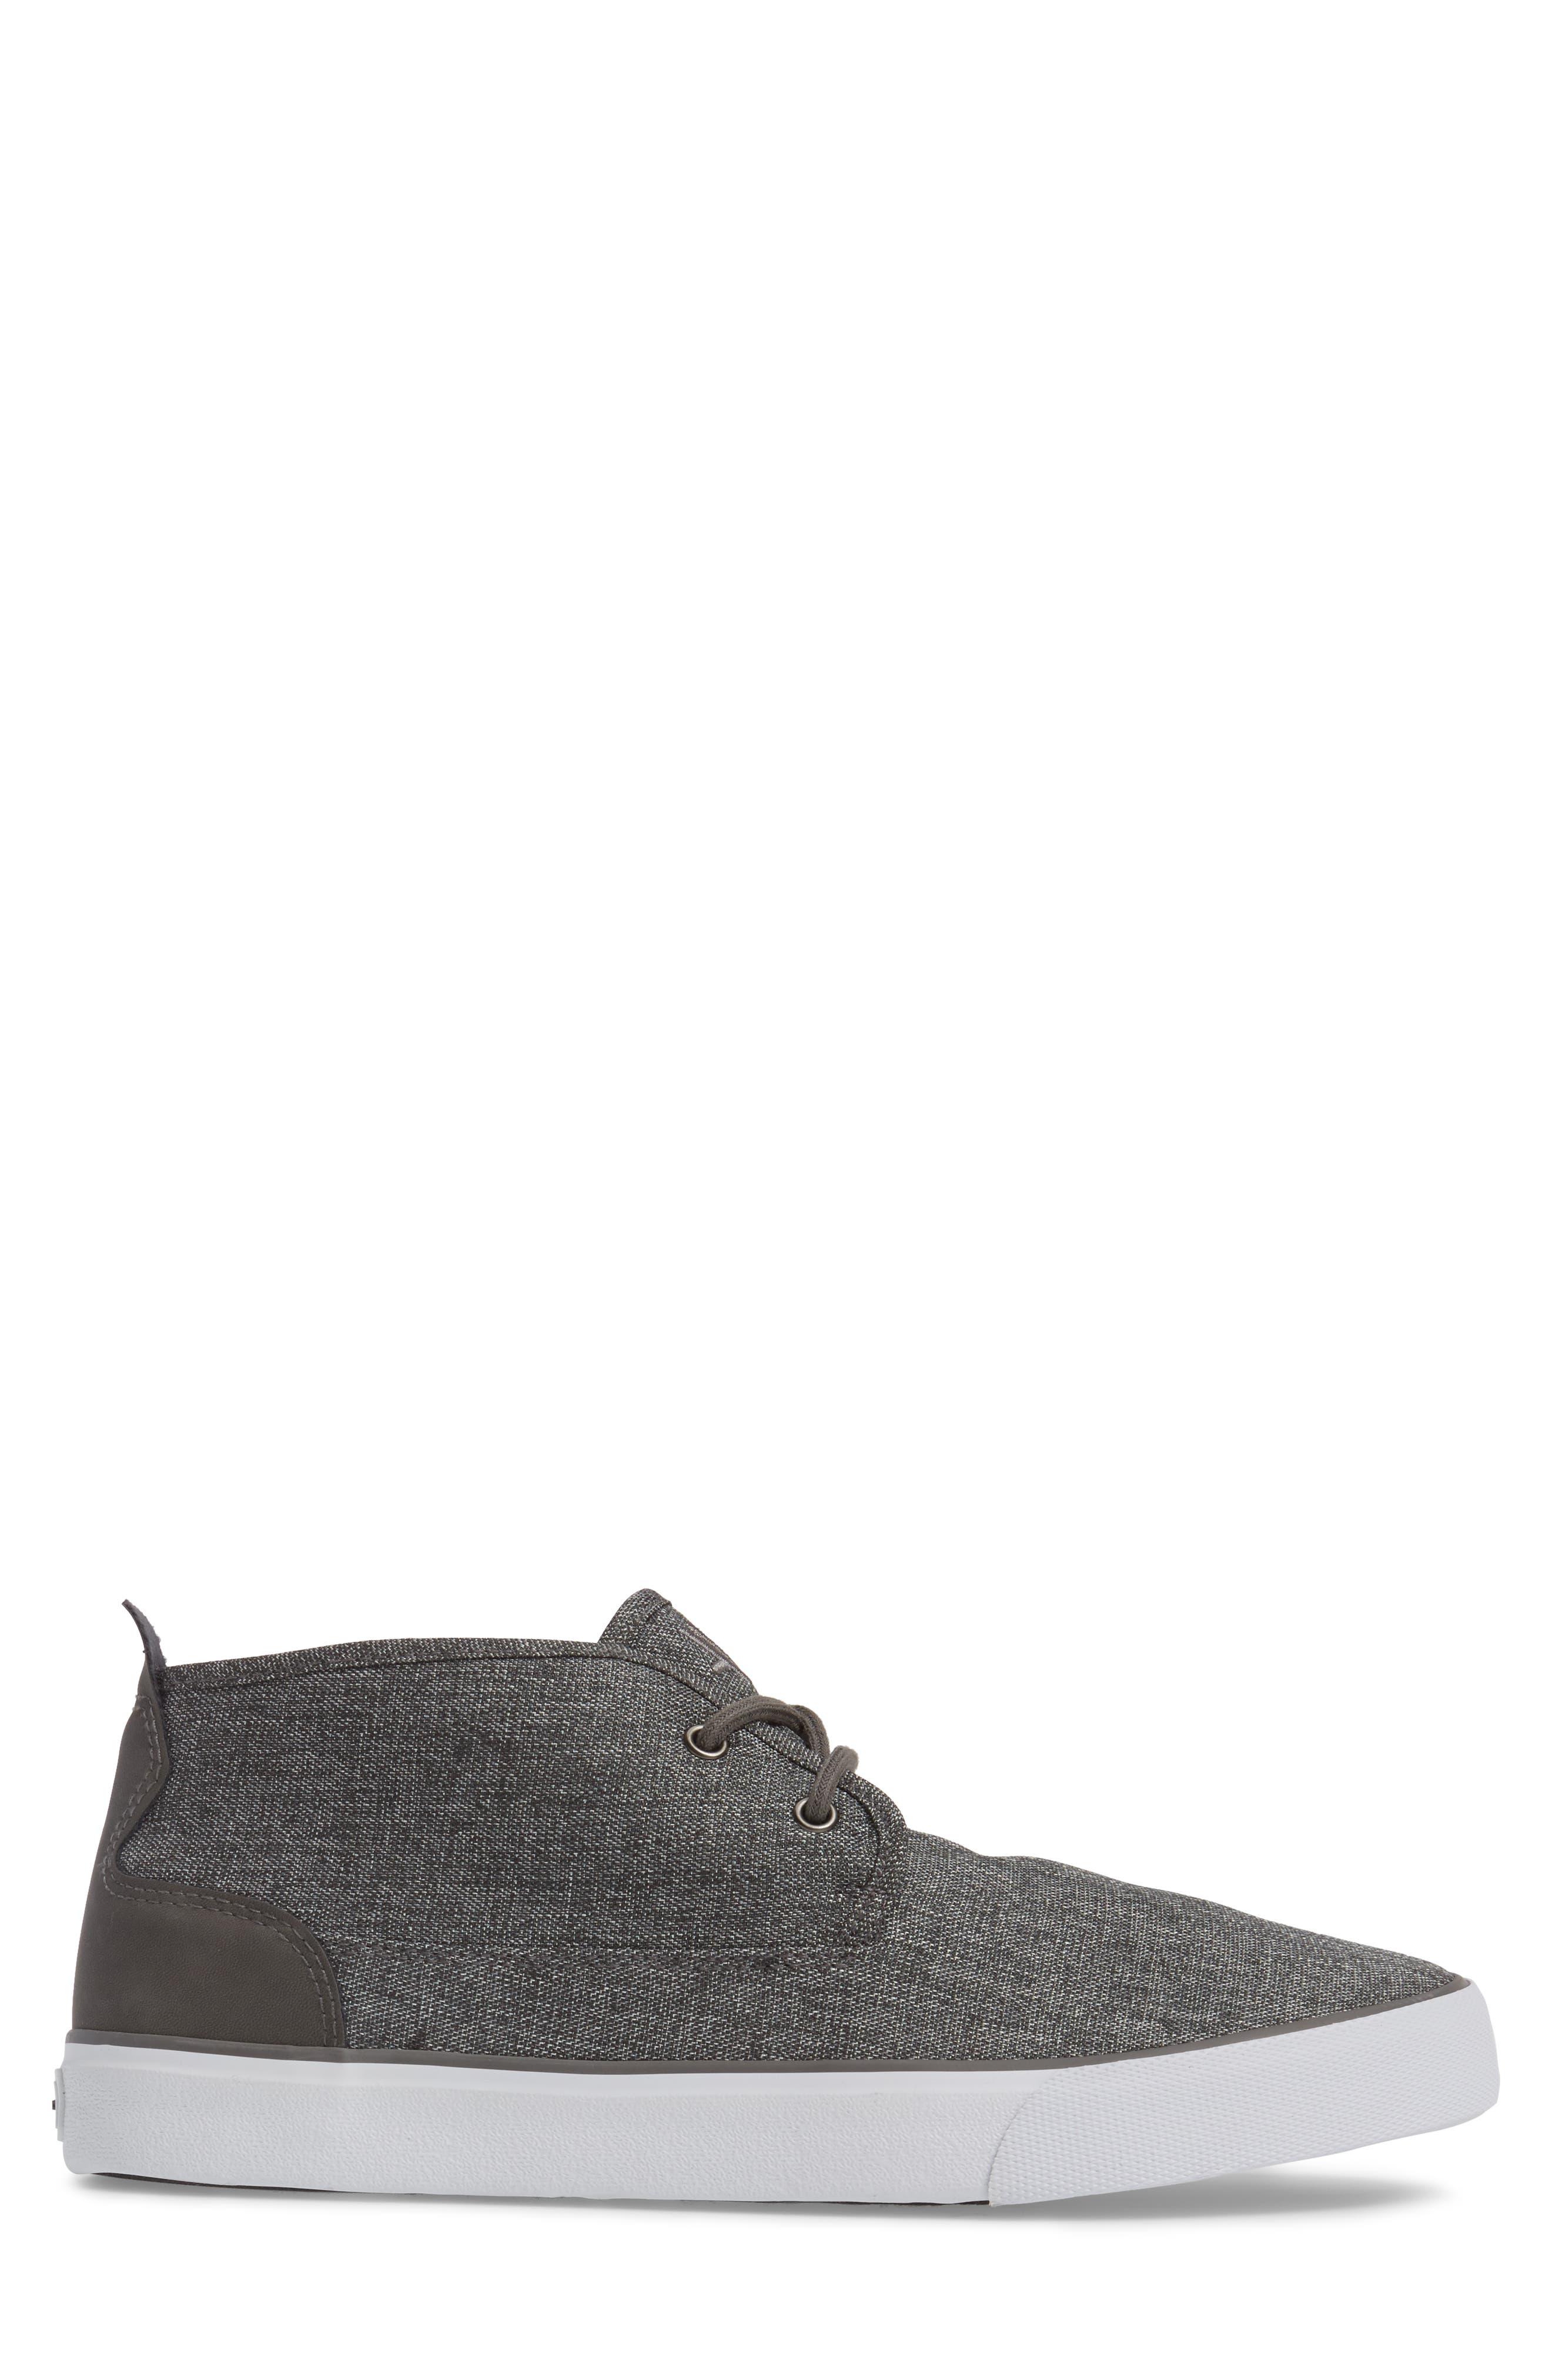 Reade Chukka Sneaker,                             Alternate thumbnail 3, color,                             Charcoal/Dk Charcoal/White